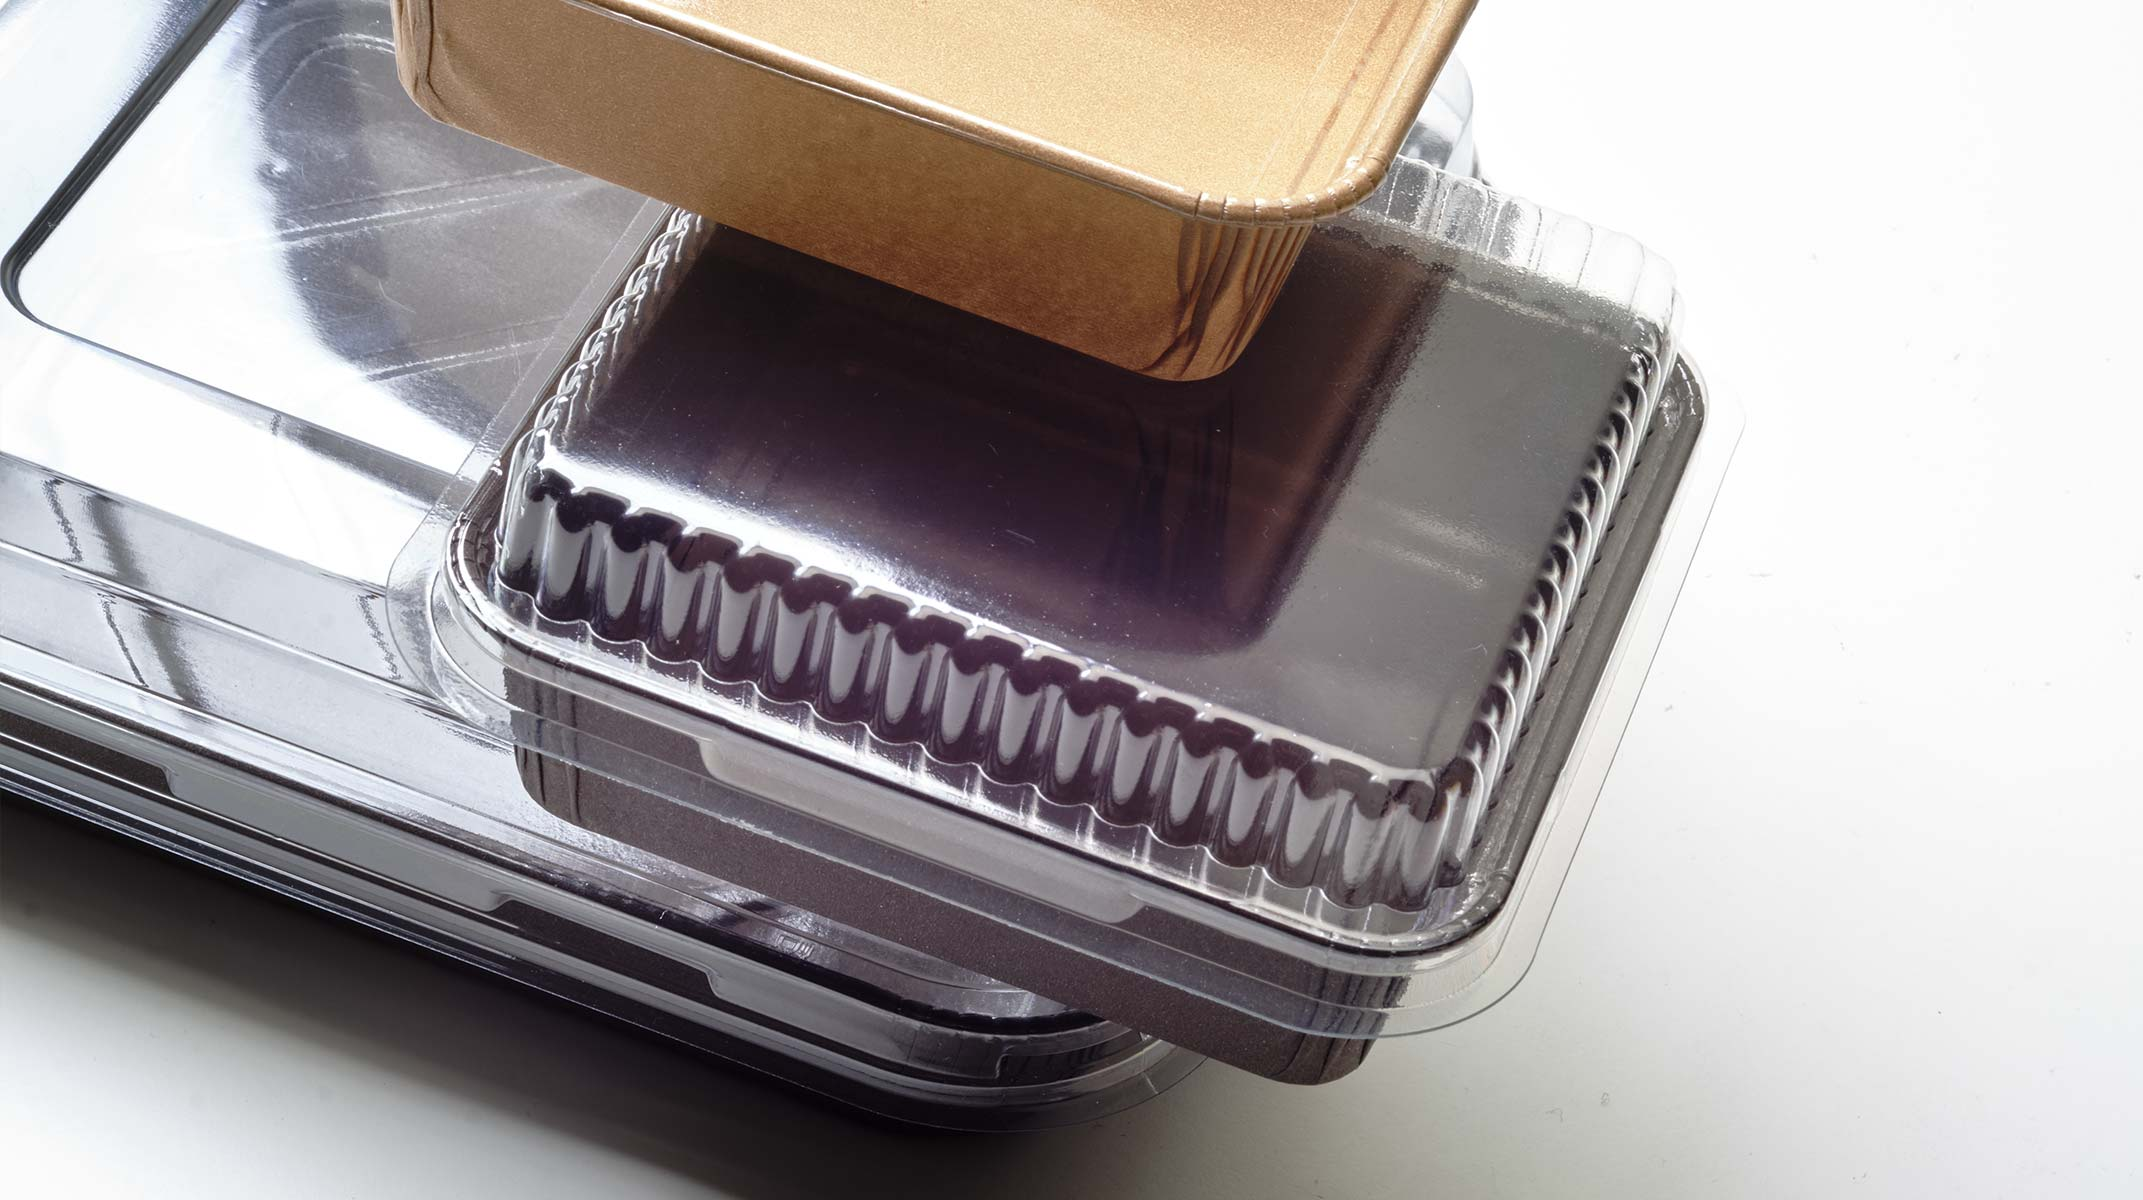 Techno Papier boxes